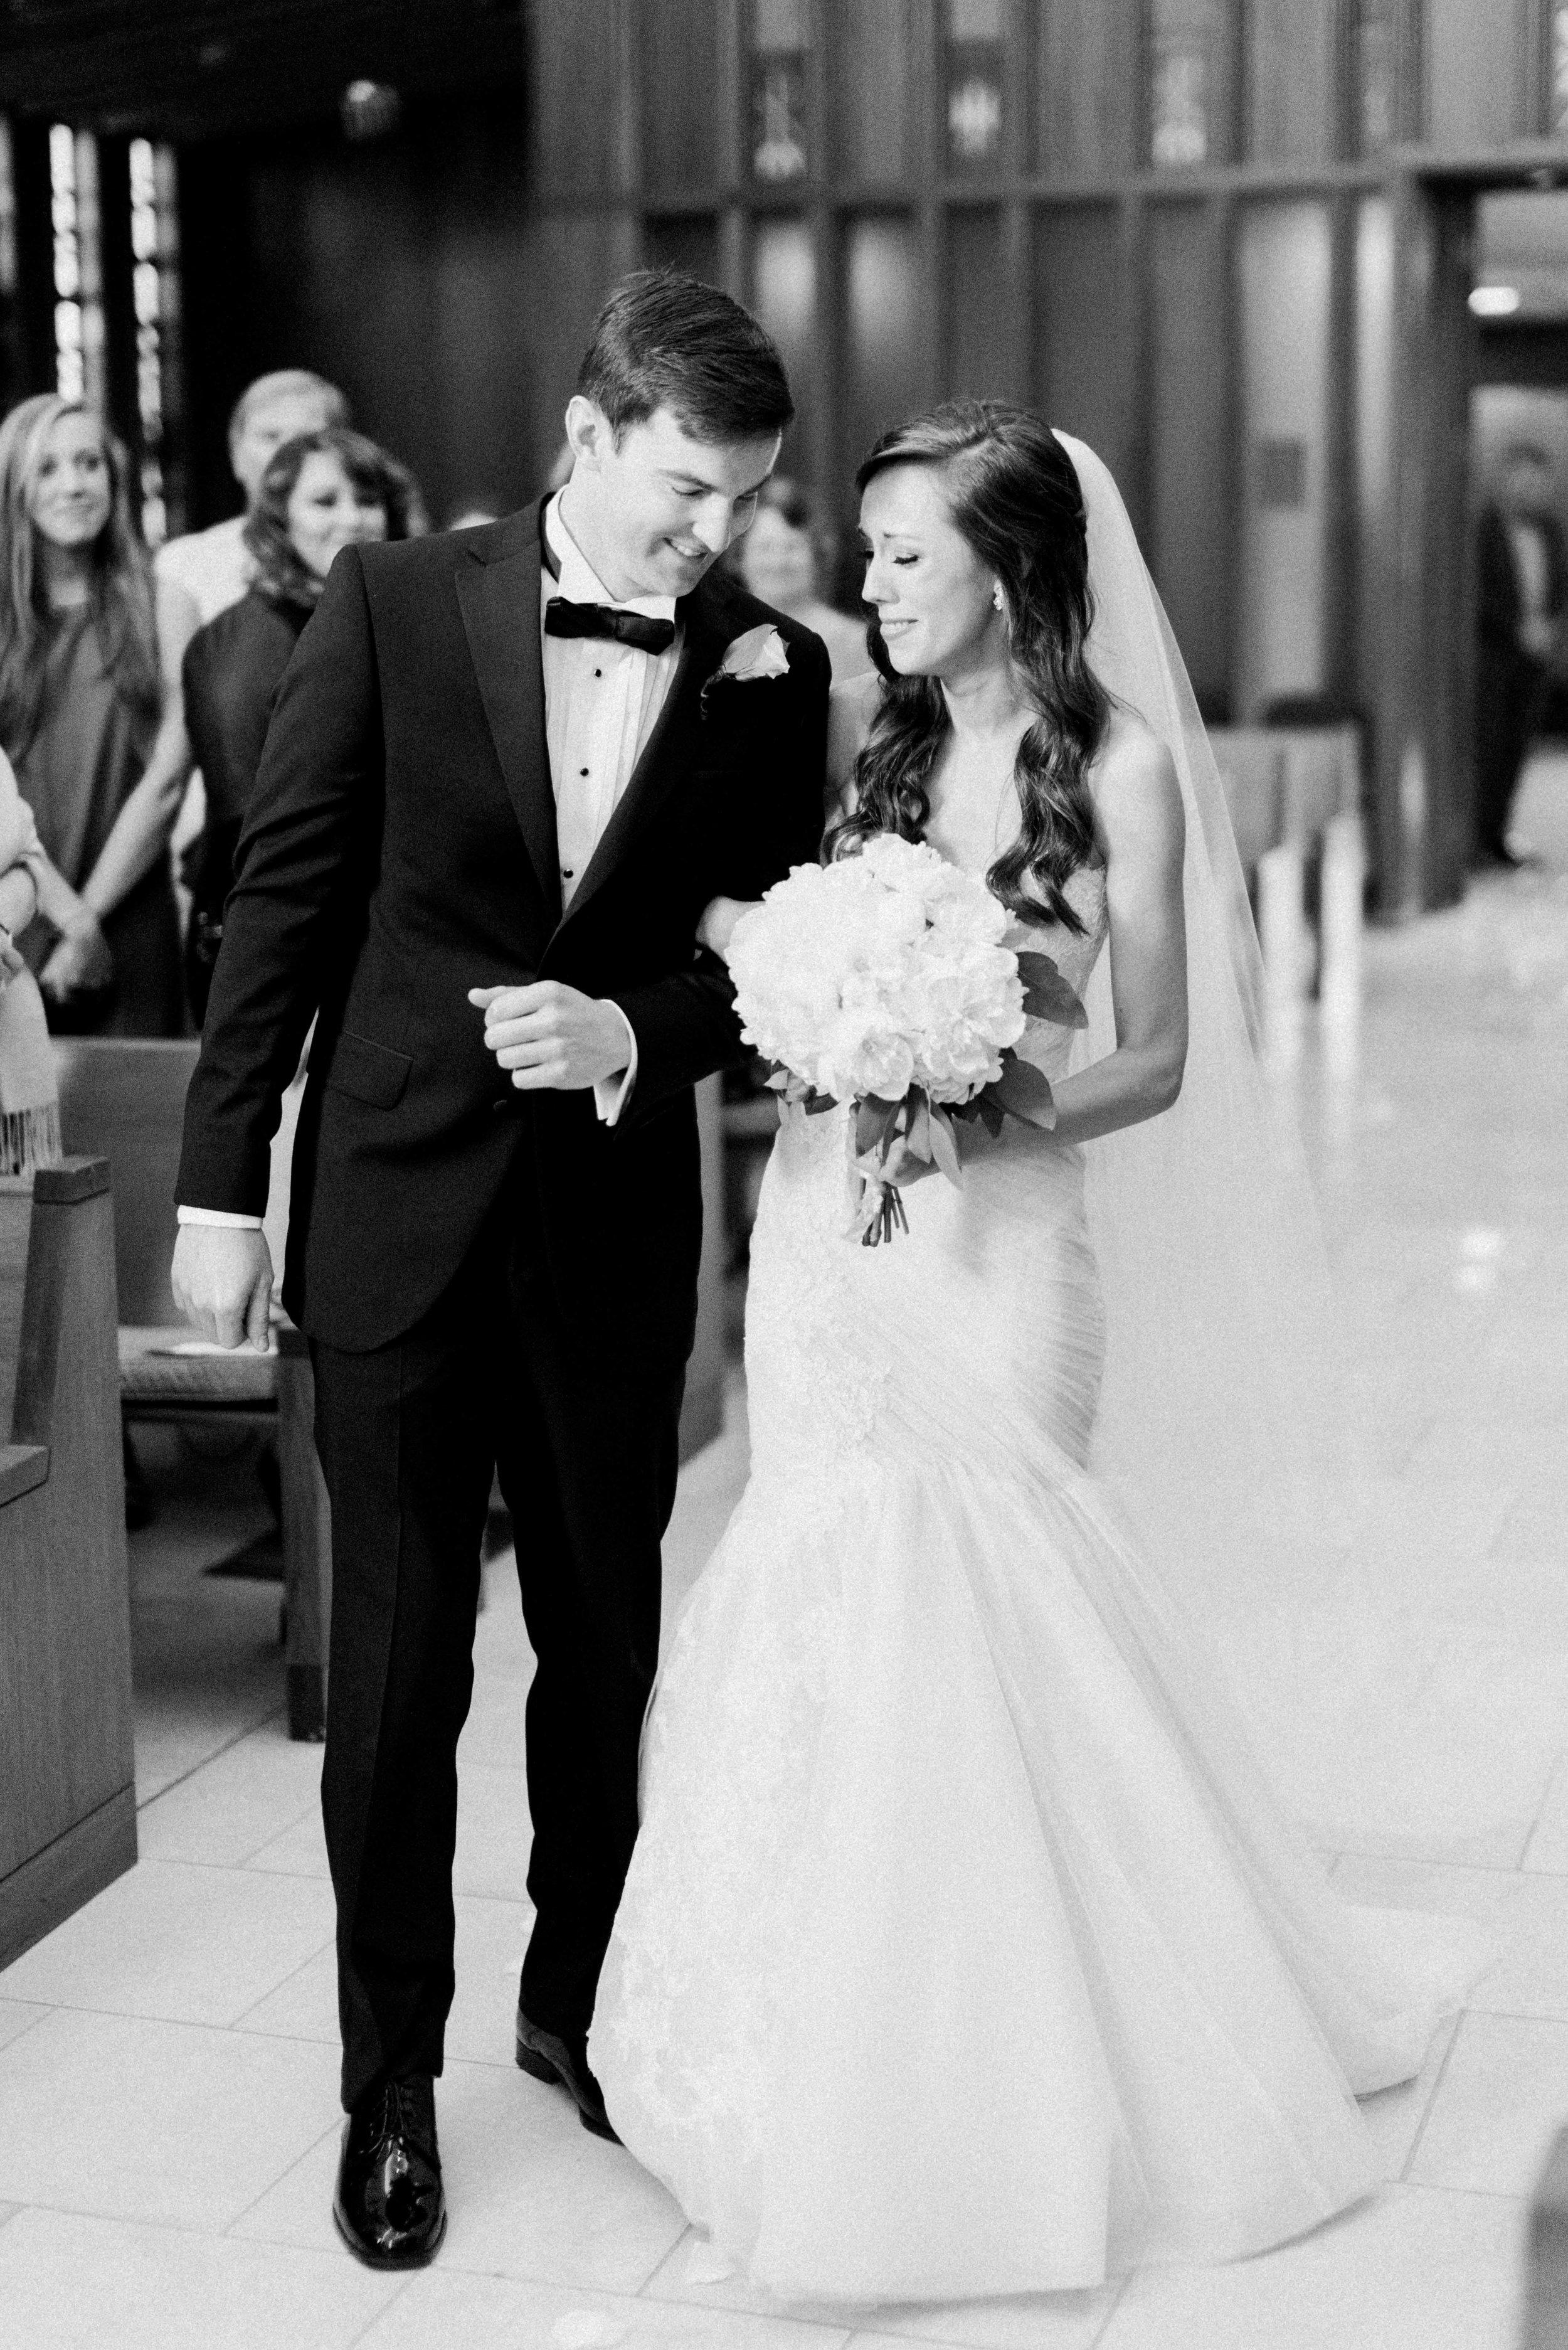 St.-Philip-Presbyterian-Church-Houston-Wedding-Ceremony-The-Junior-League-Of-Houston-Reception-Dana-Fernandez-Photography-Fine-Art-Film-23.jpg